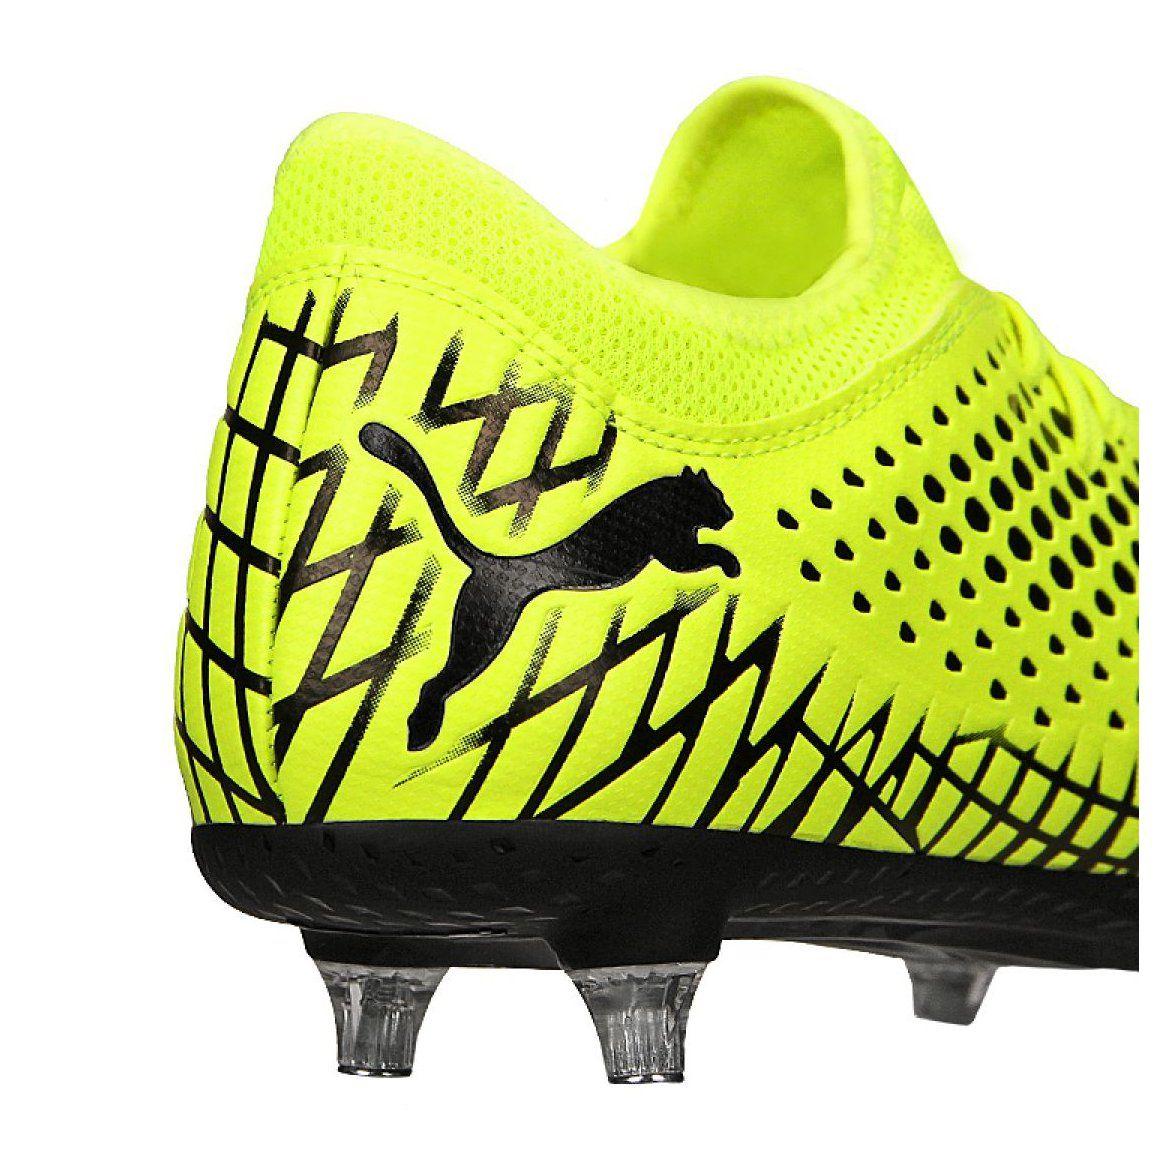 Buty Pilkarskie Puma Future 4 4 Sg Fg M 105687 02 Zolte Zolte Football Boots Football Shoes Puma